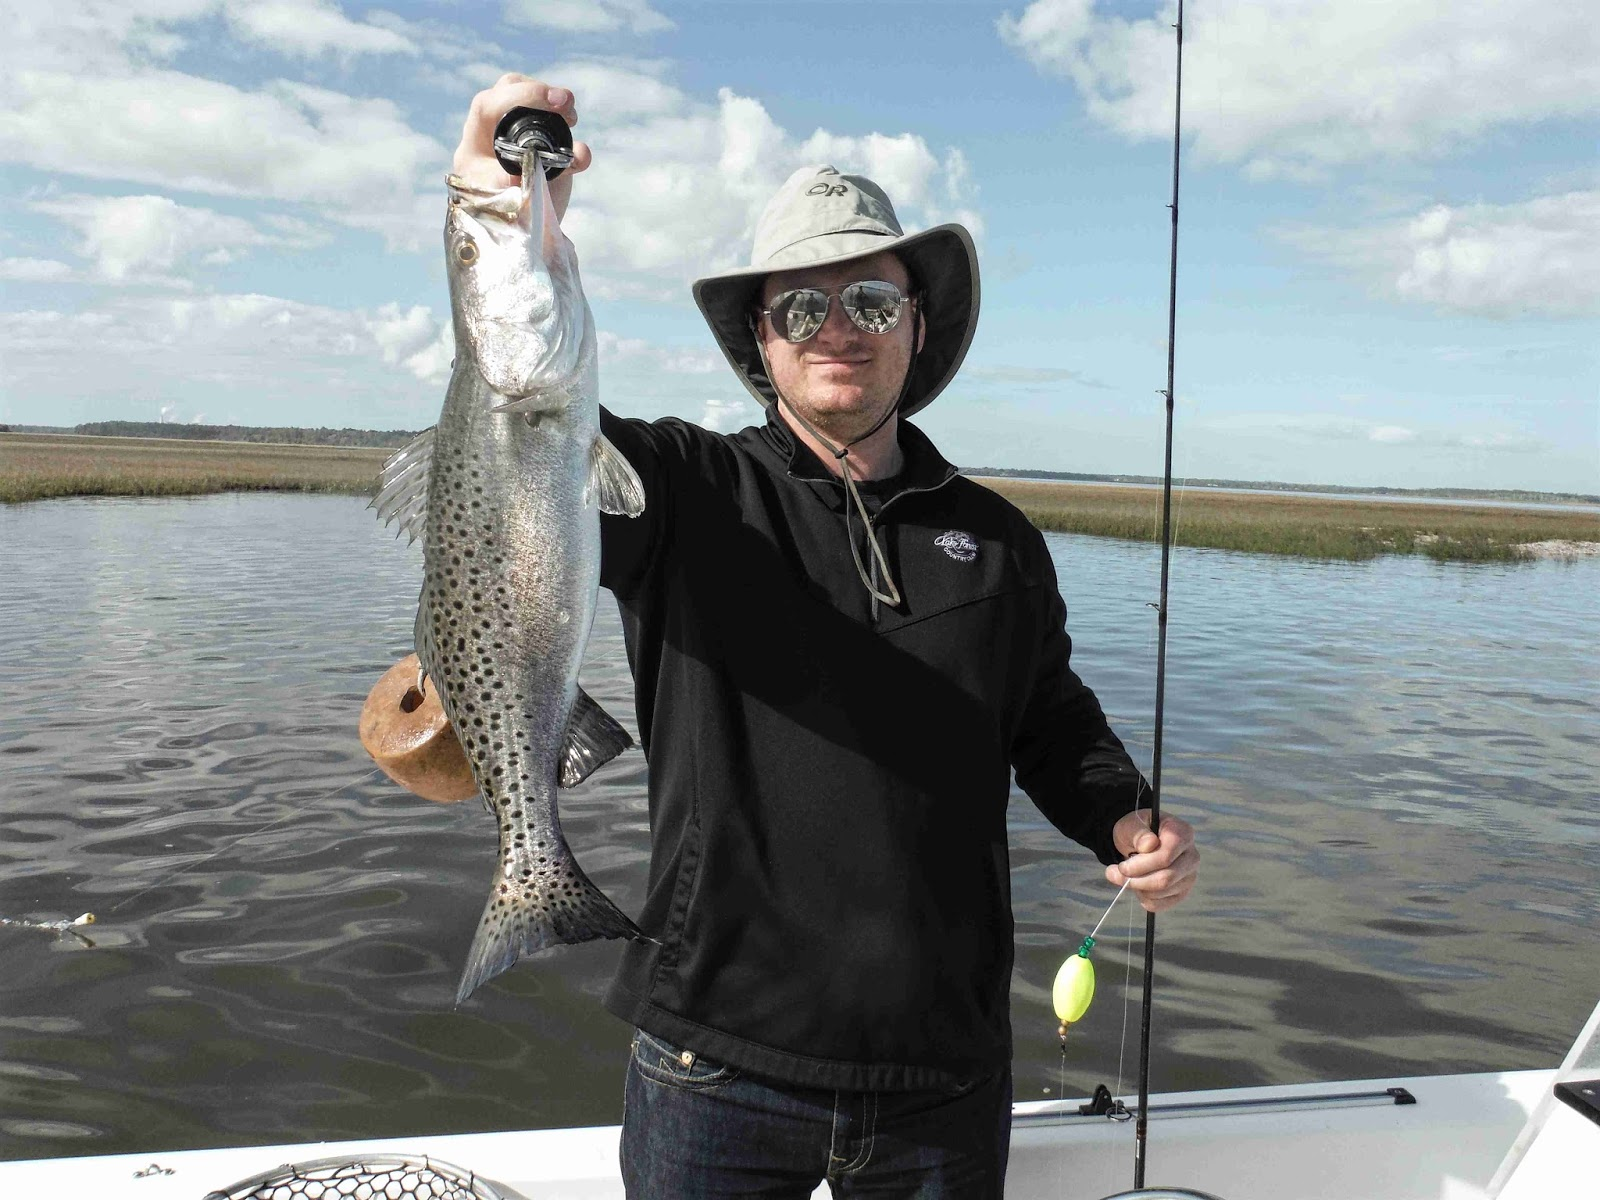 Amelia island fishing reports thinning the herd for Amelia island fishing report